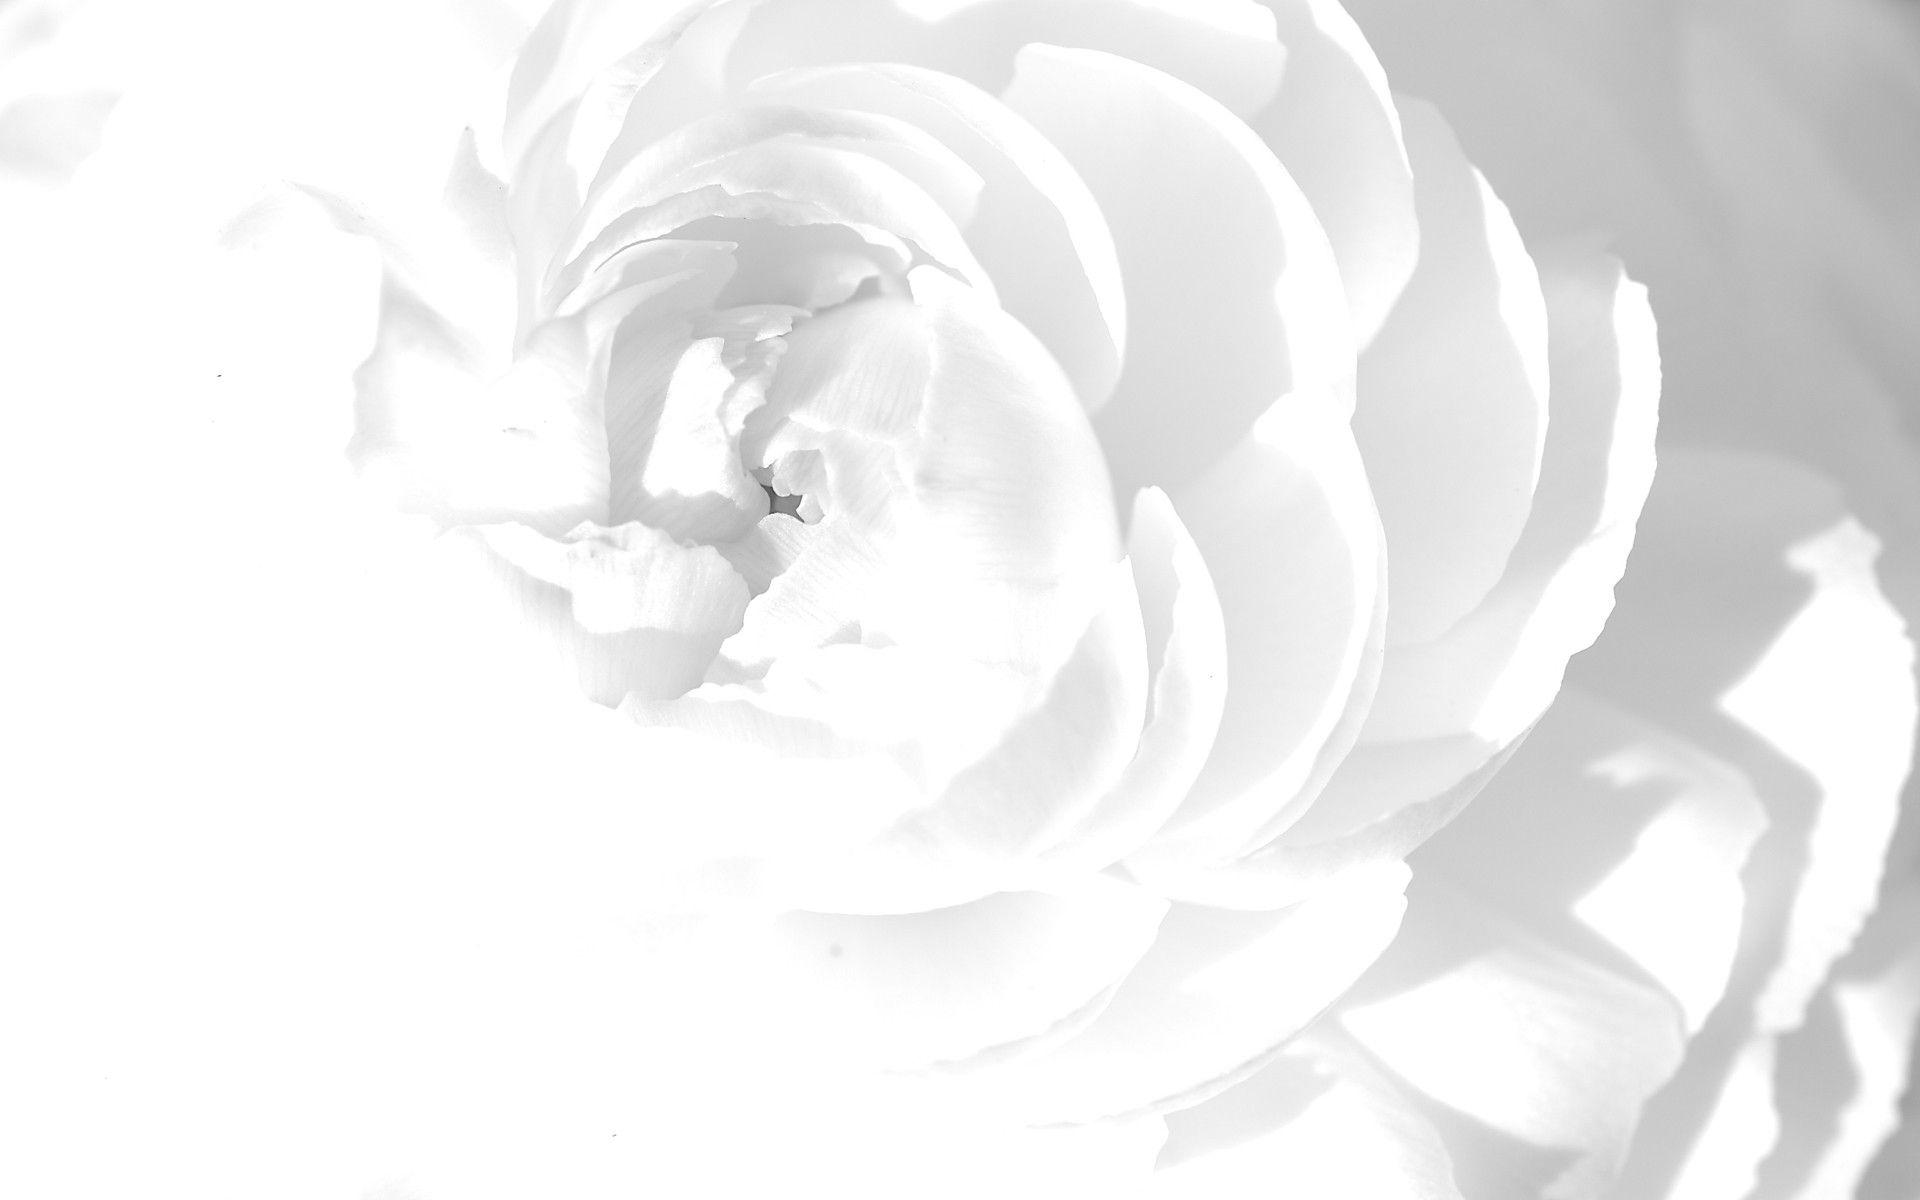 Flower Art White Background Hd Wallpaper Ideas For The House